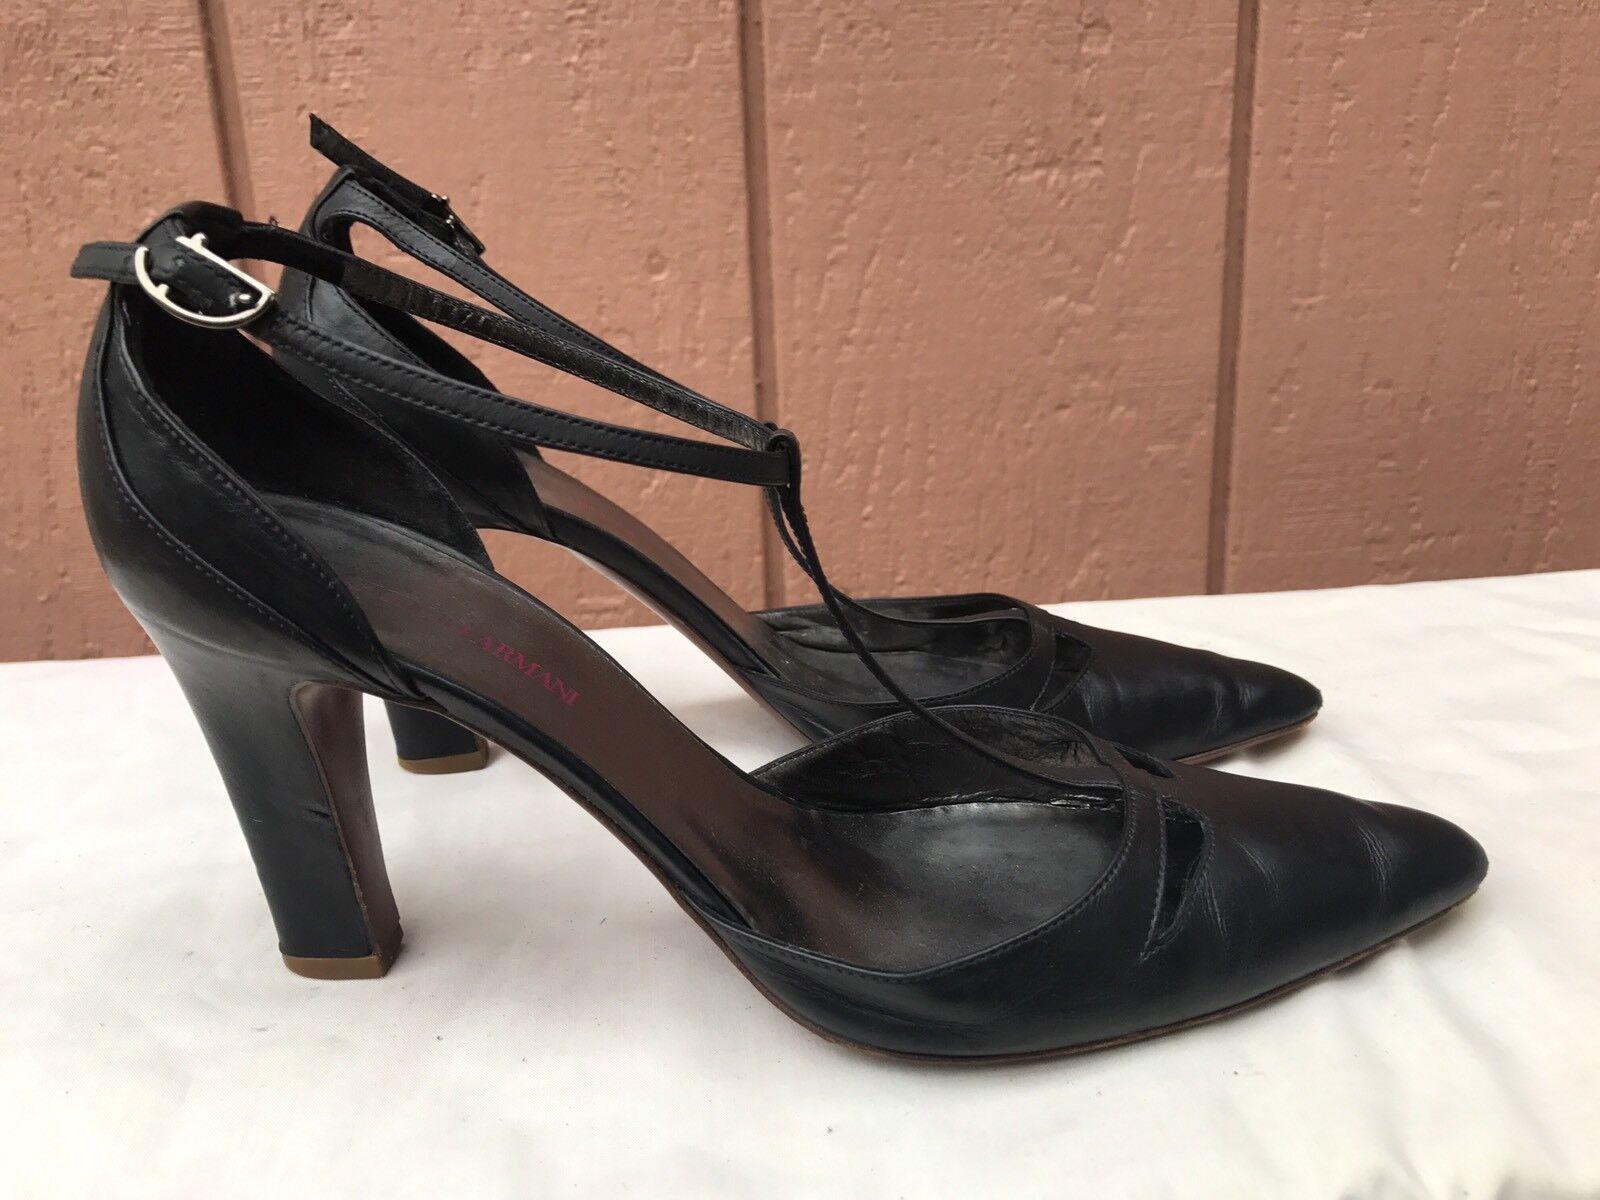 Giorgio Armani Collezioni Collezioni Collezioni Black Leather T-strap Pumps Heels EUR 38 US 7  495 c1f480